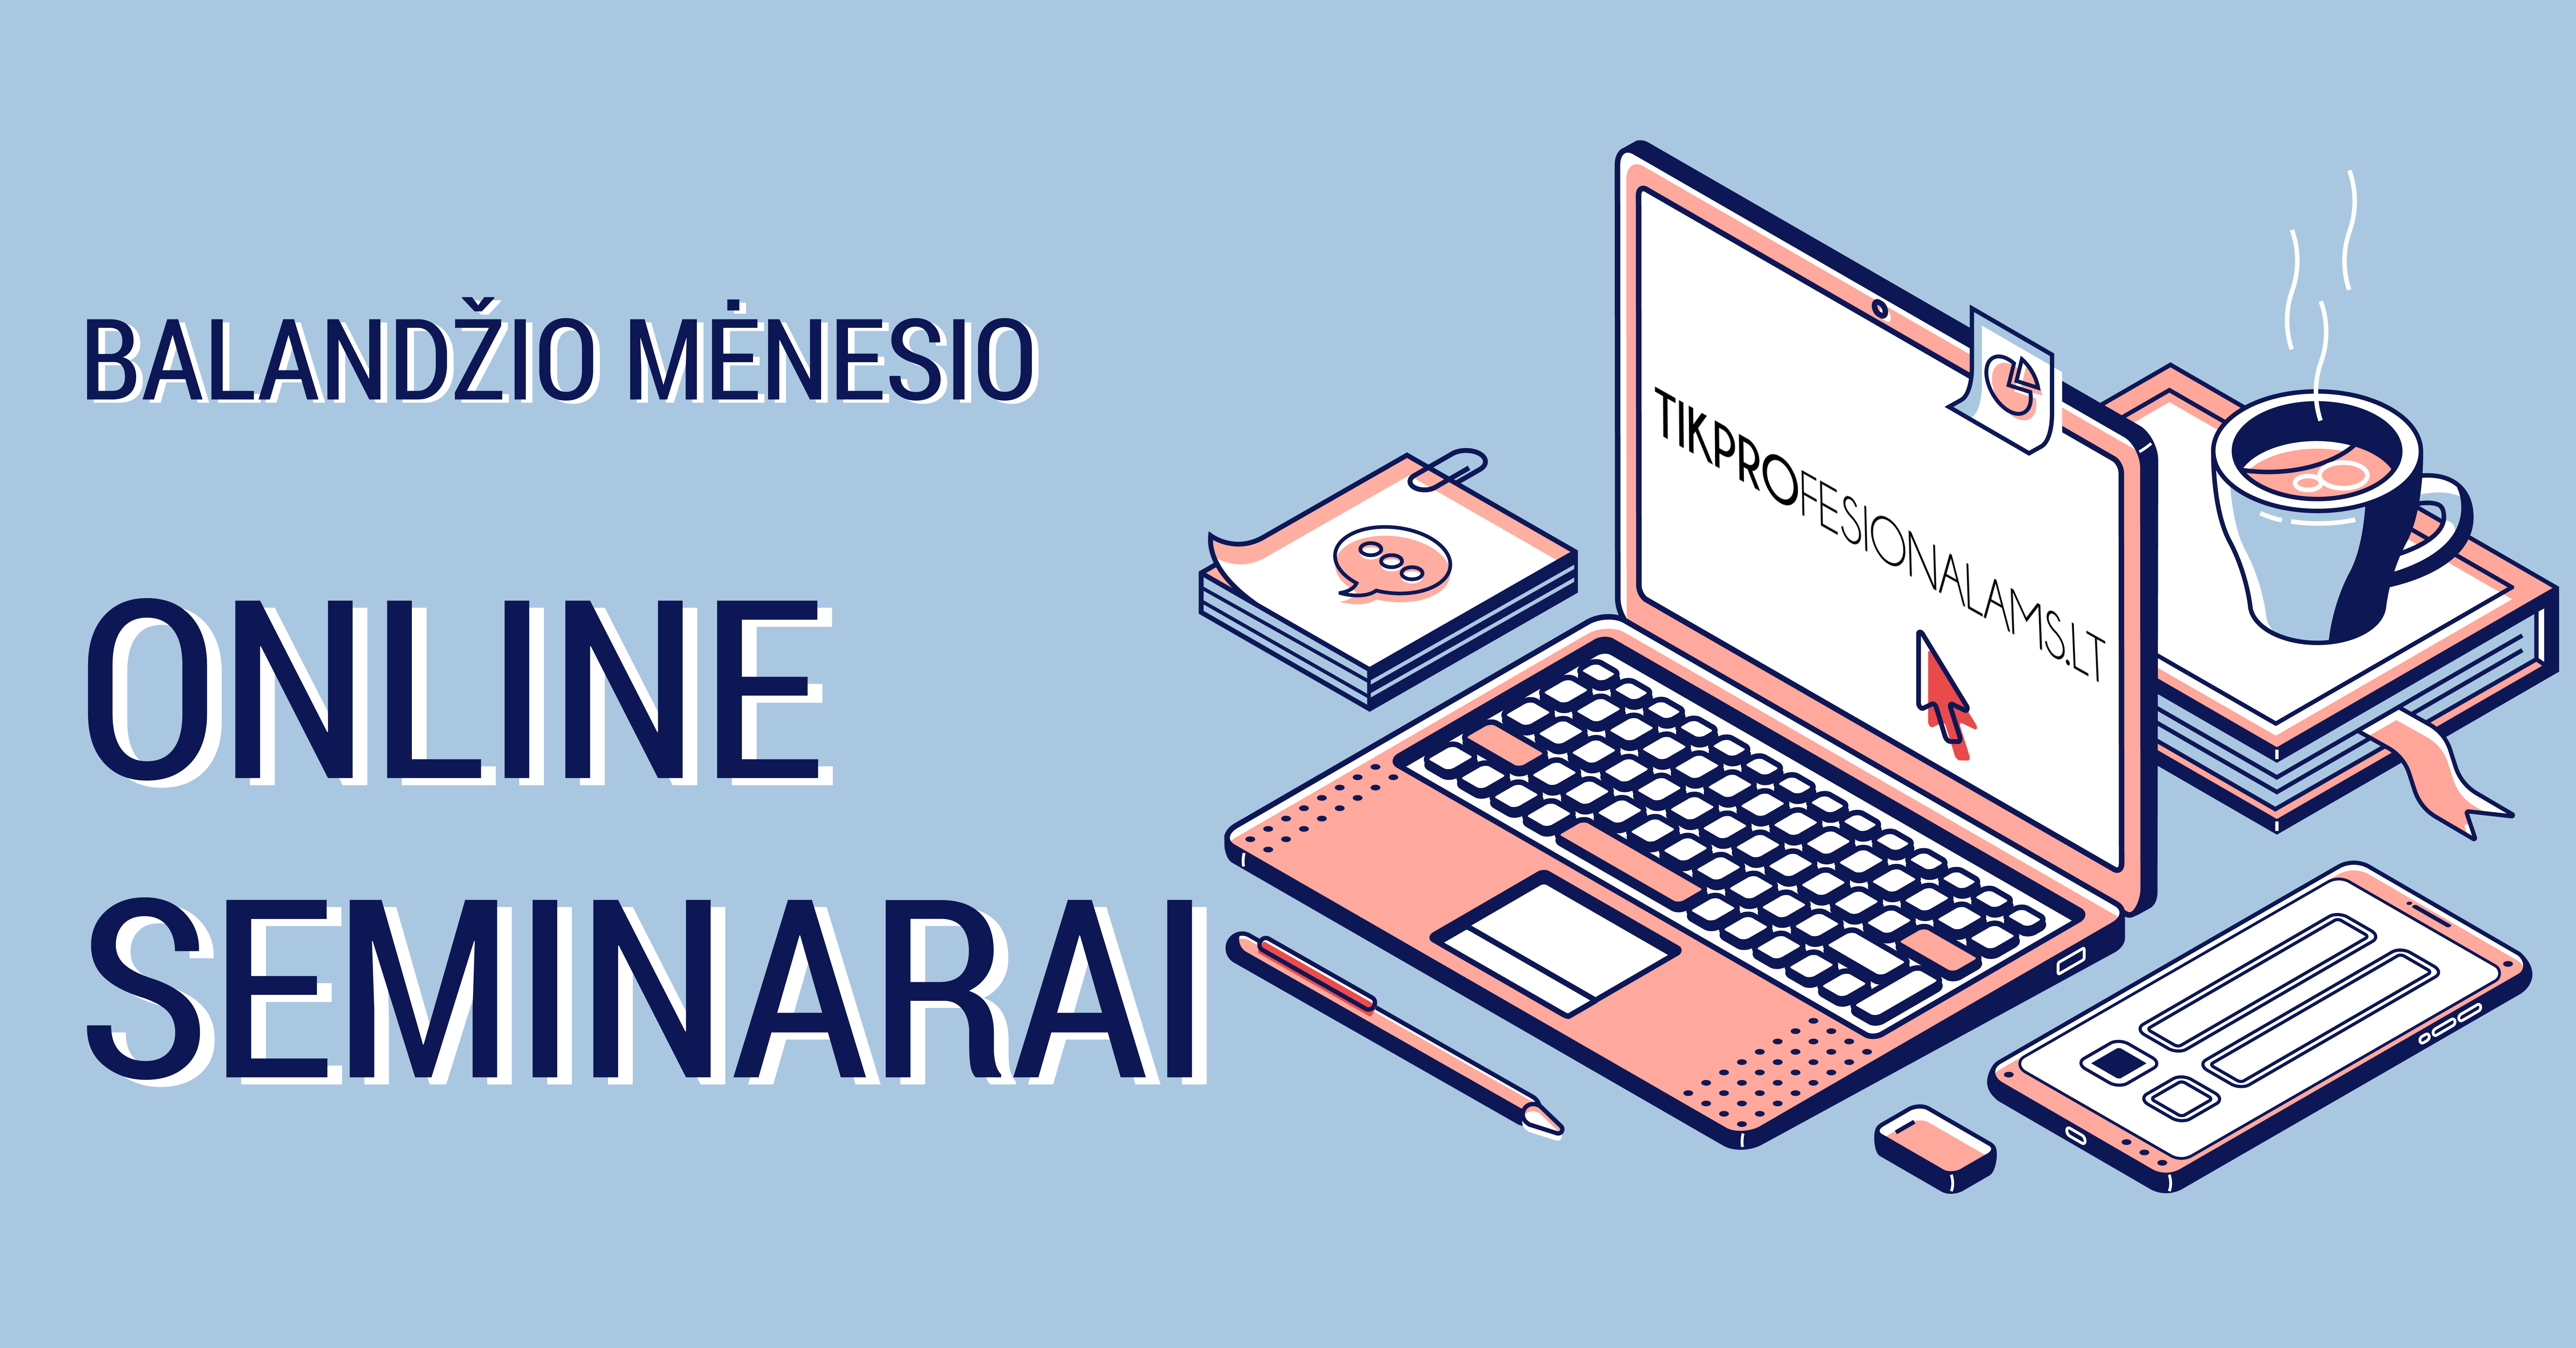 Online seminarai, balandis